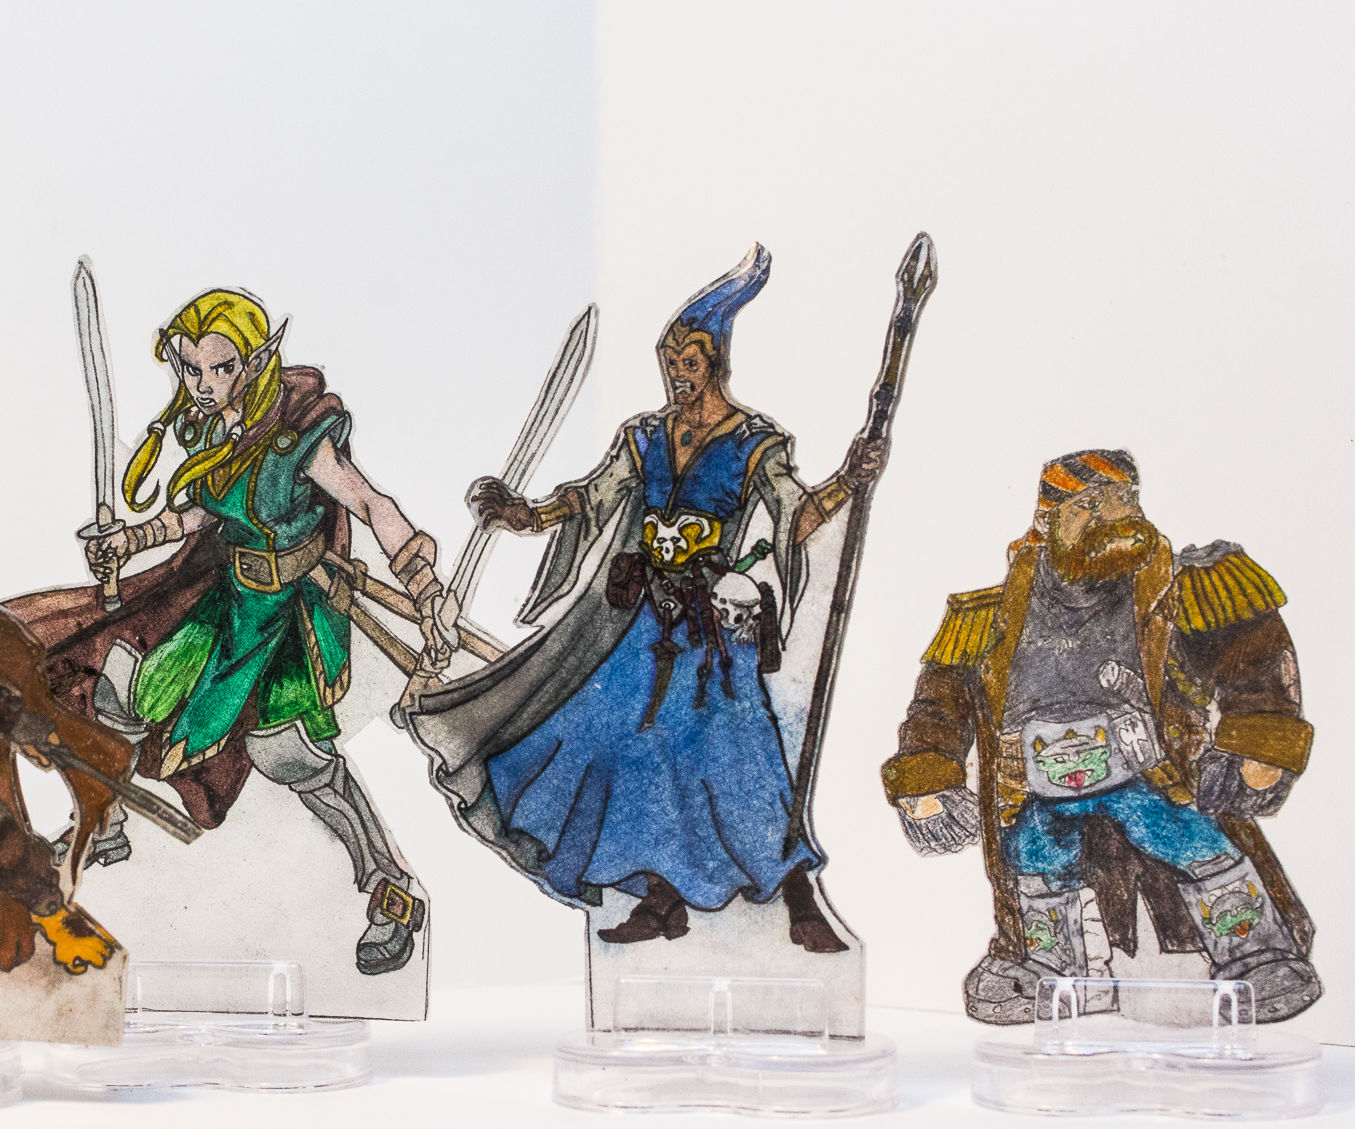 Shrinky Dink D&D miniatures